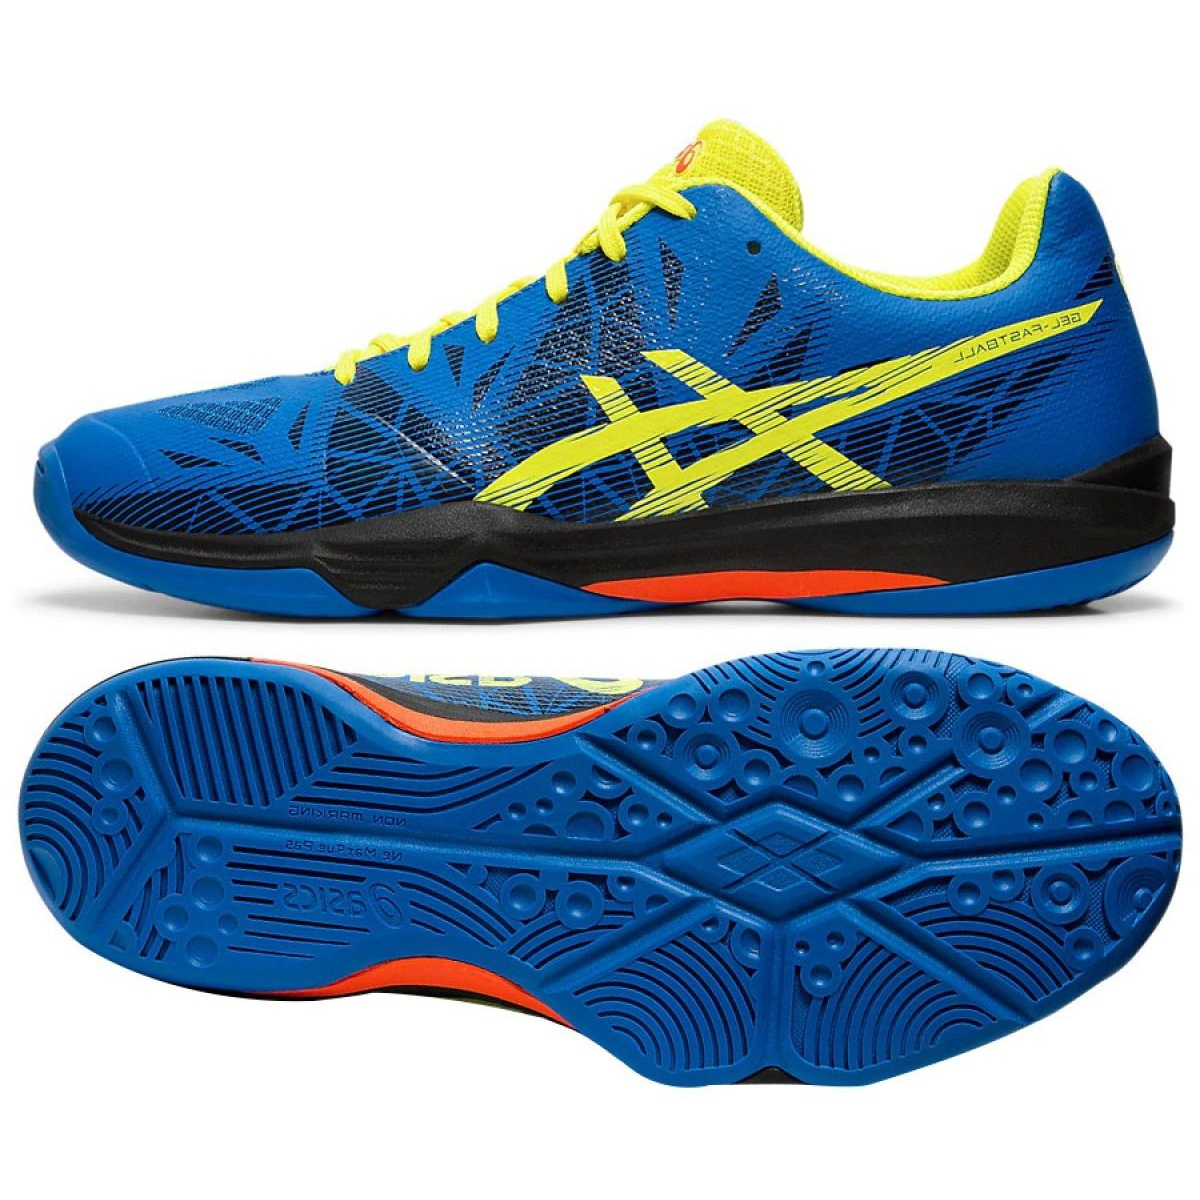 Asics Gel Fastball 3 M E712N-401 shoes blue blue